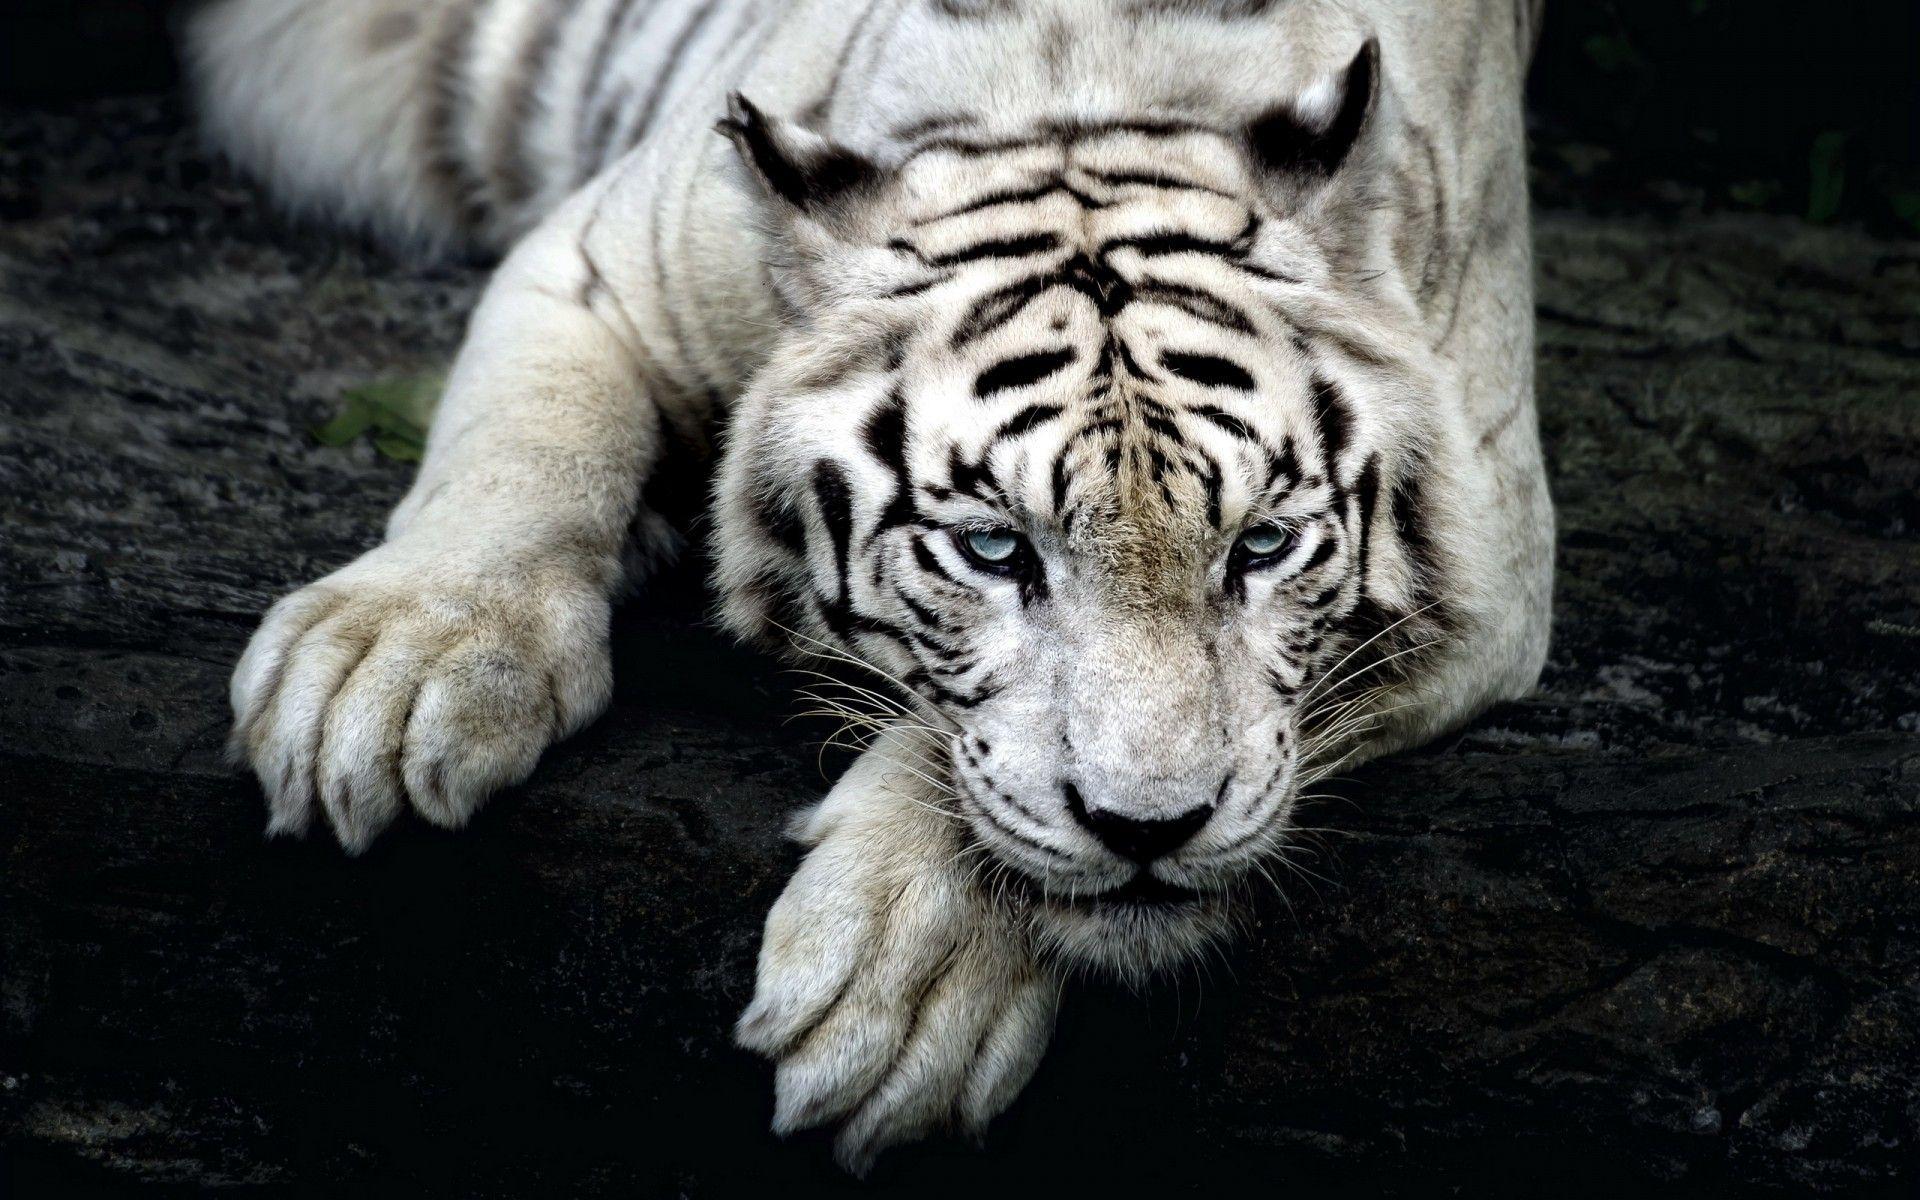 White Tiger, New Wallpaper